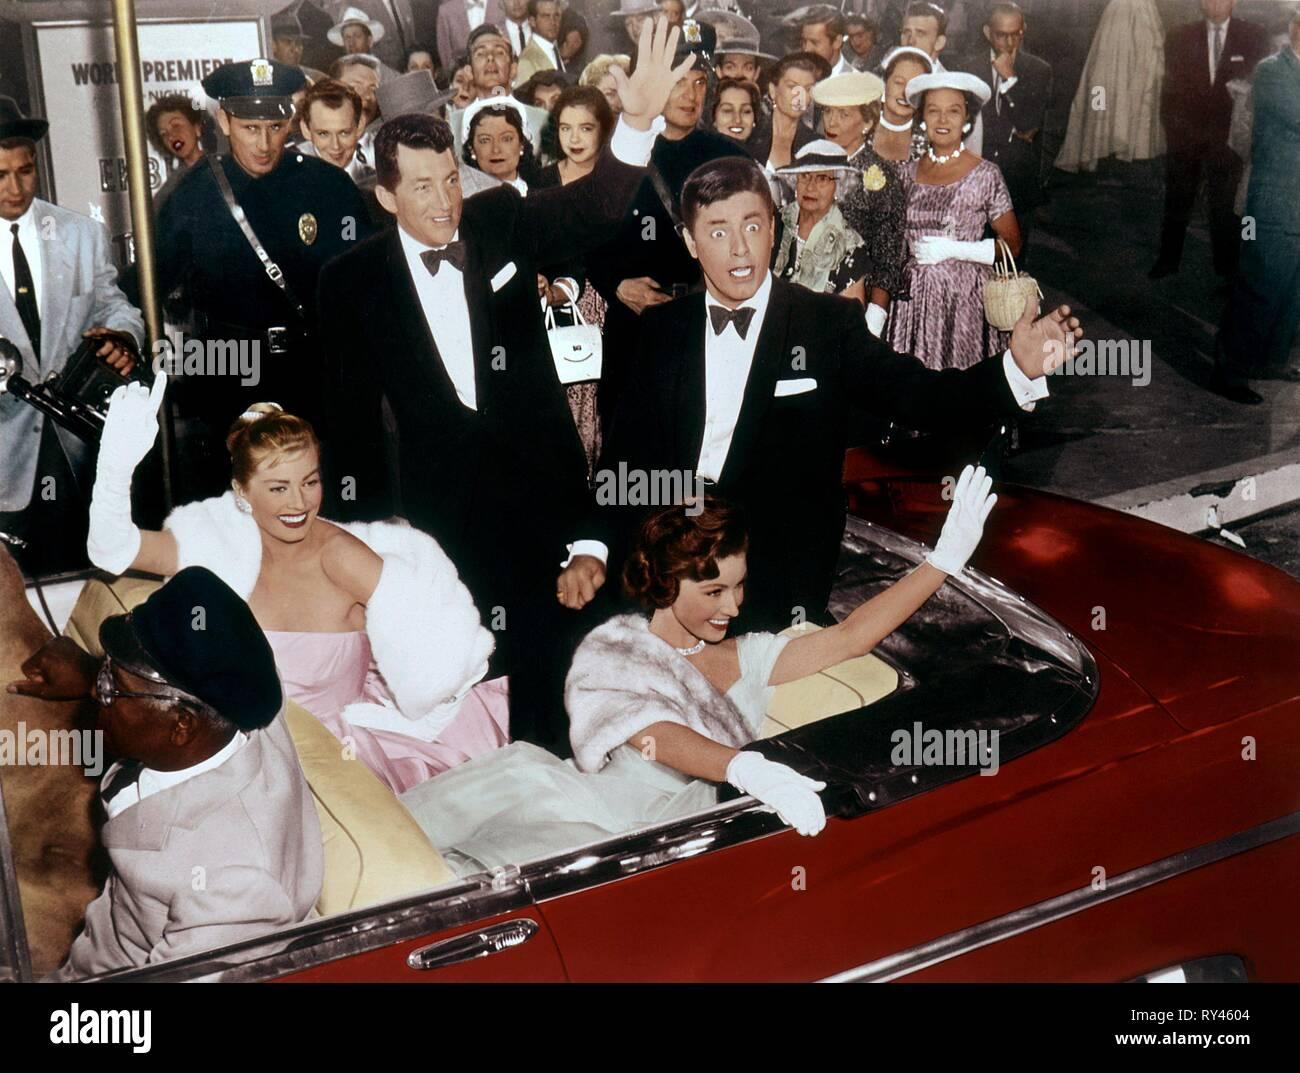 EKBERG,MARTIN,CROWLEY,LEWIS, HOLLYWOOD OR BUST, 1956 - Stock Image